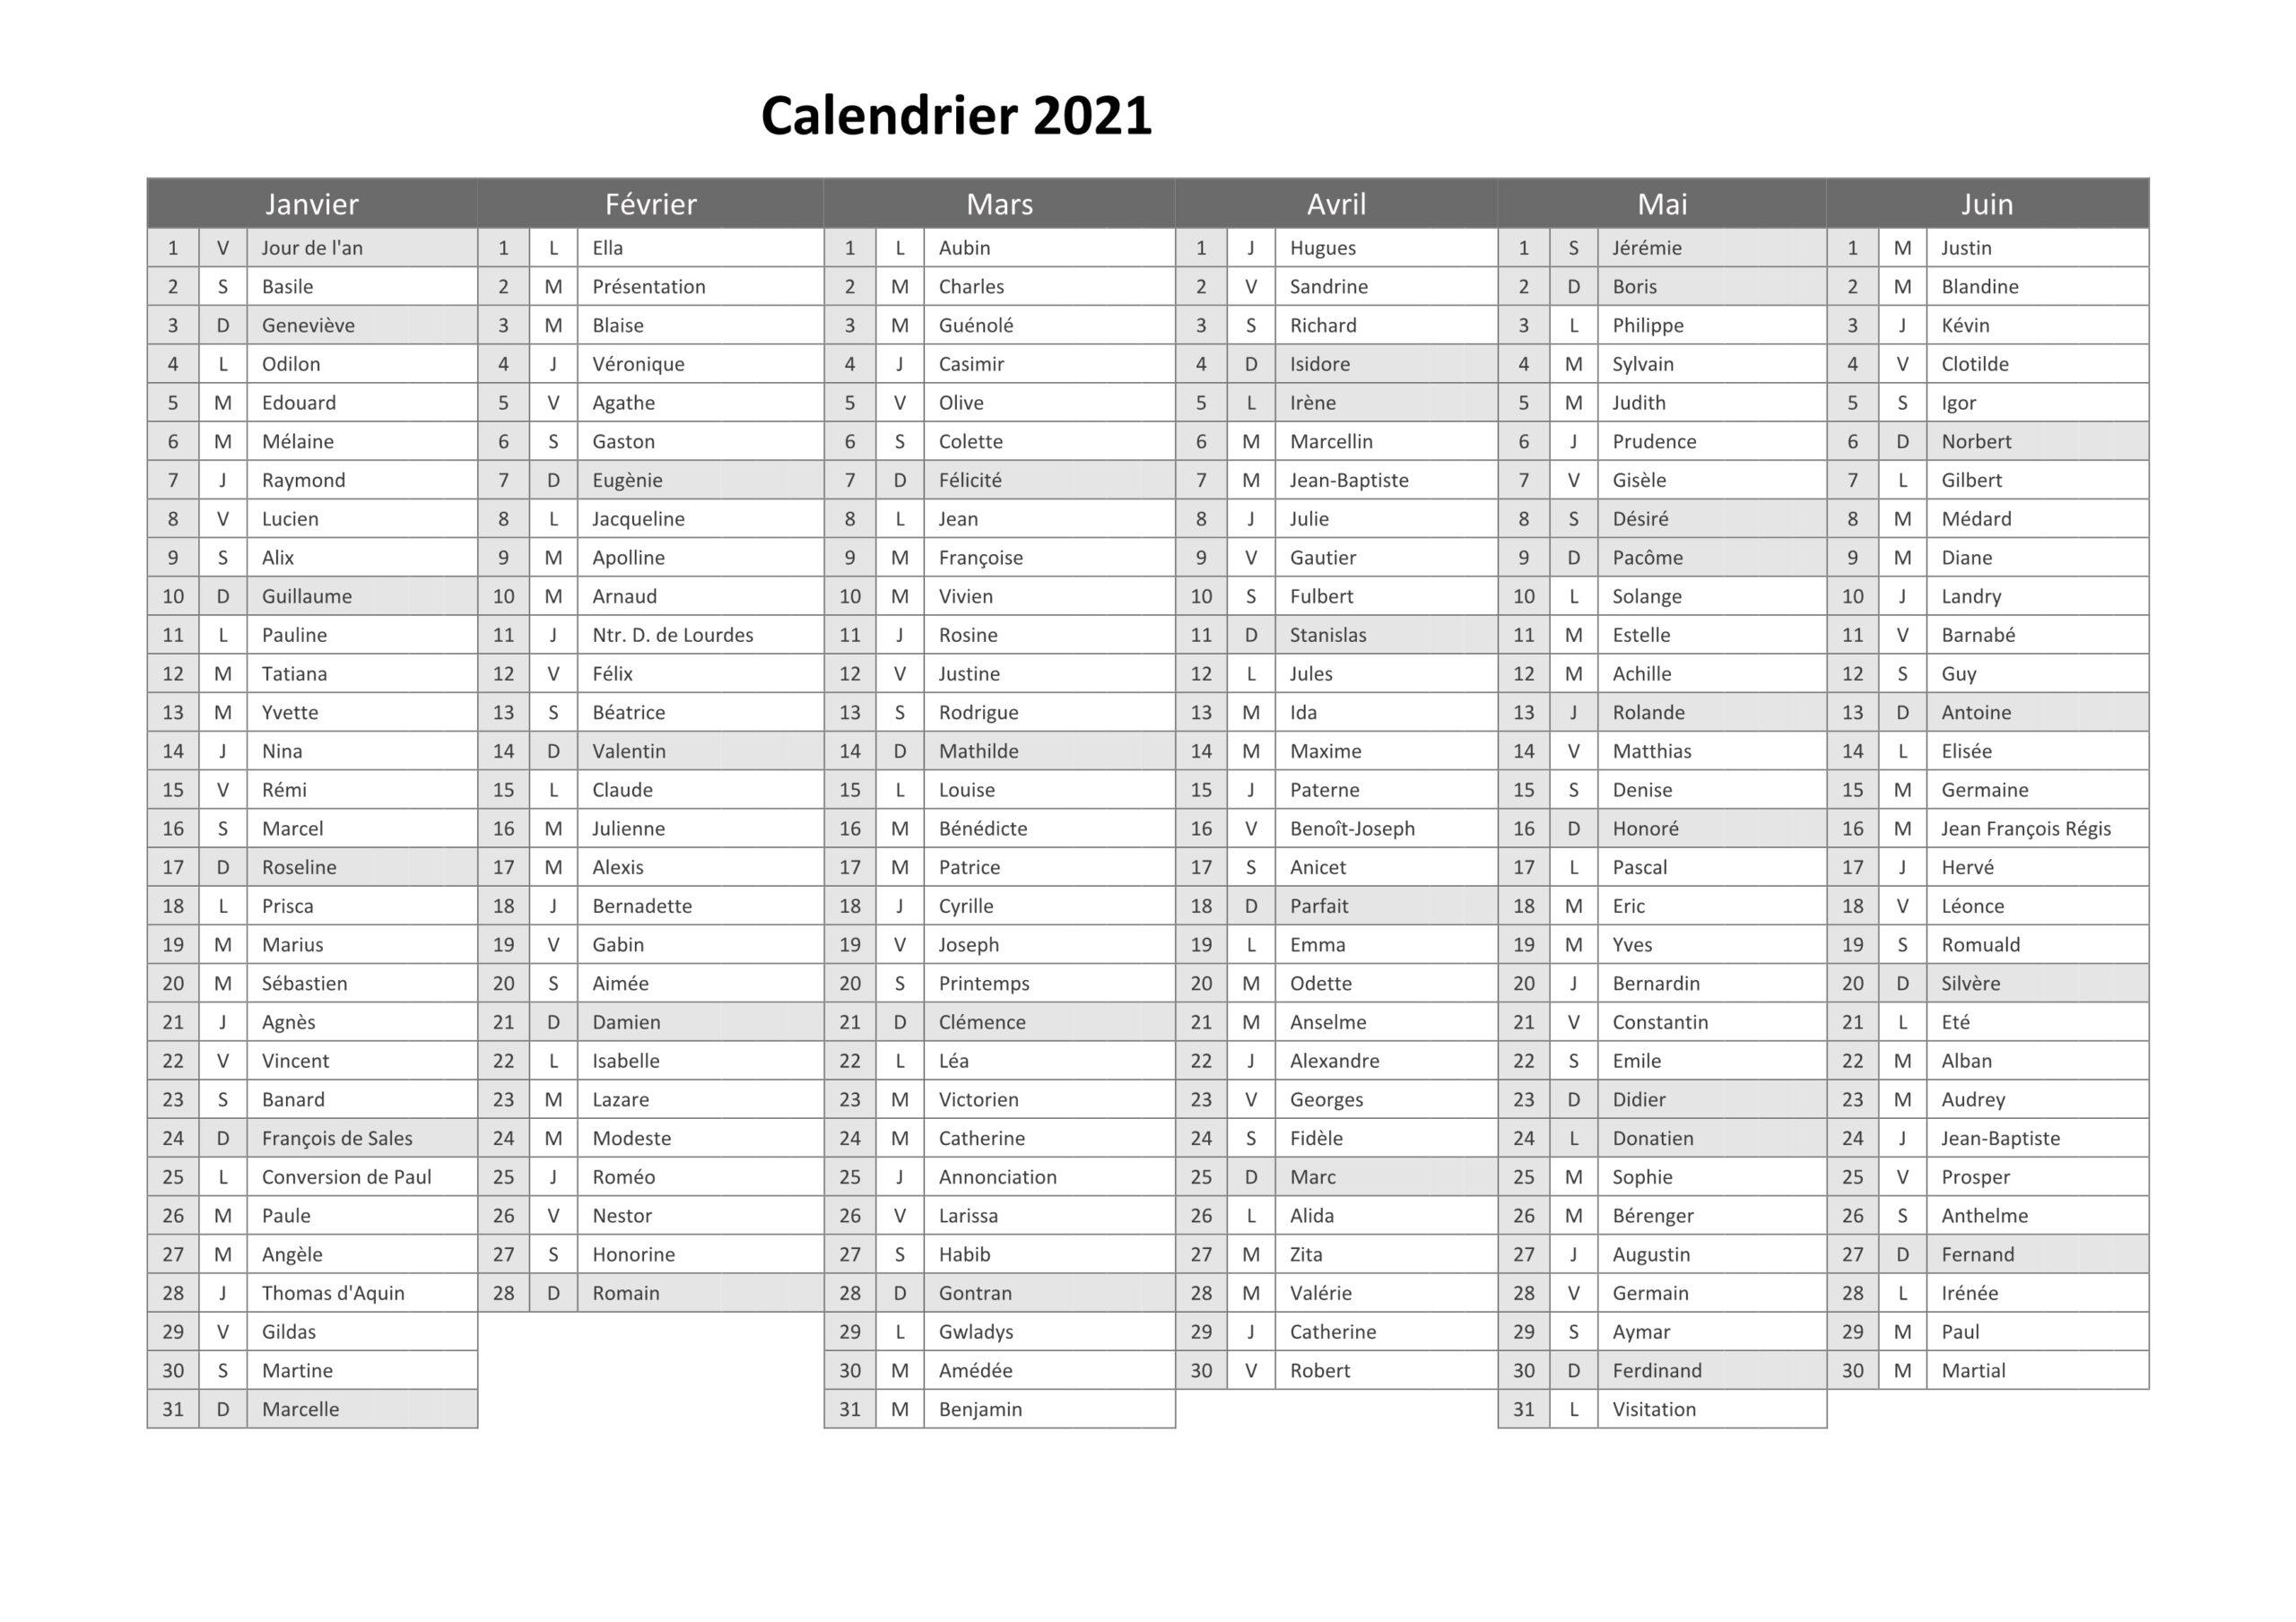 Calendrier 2021 En Semaine